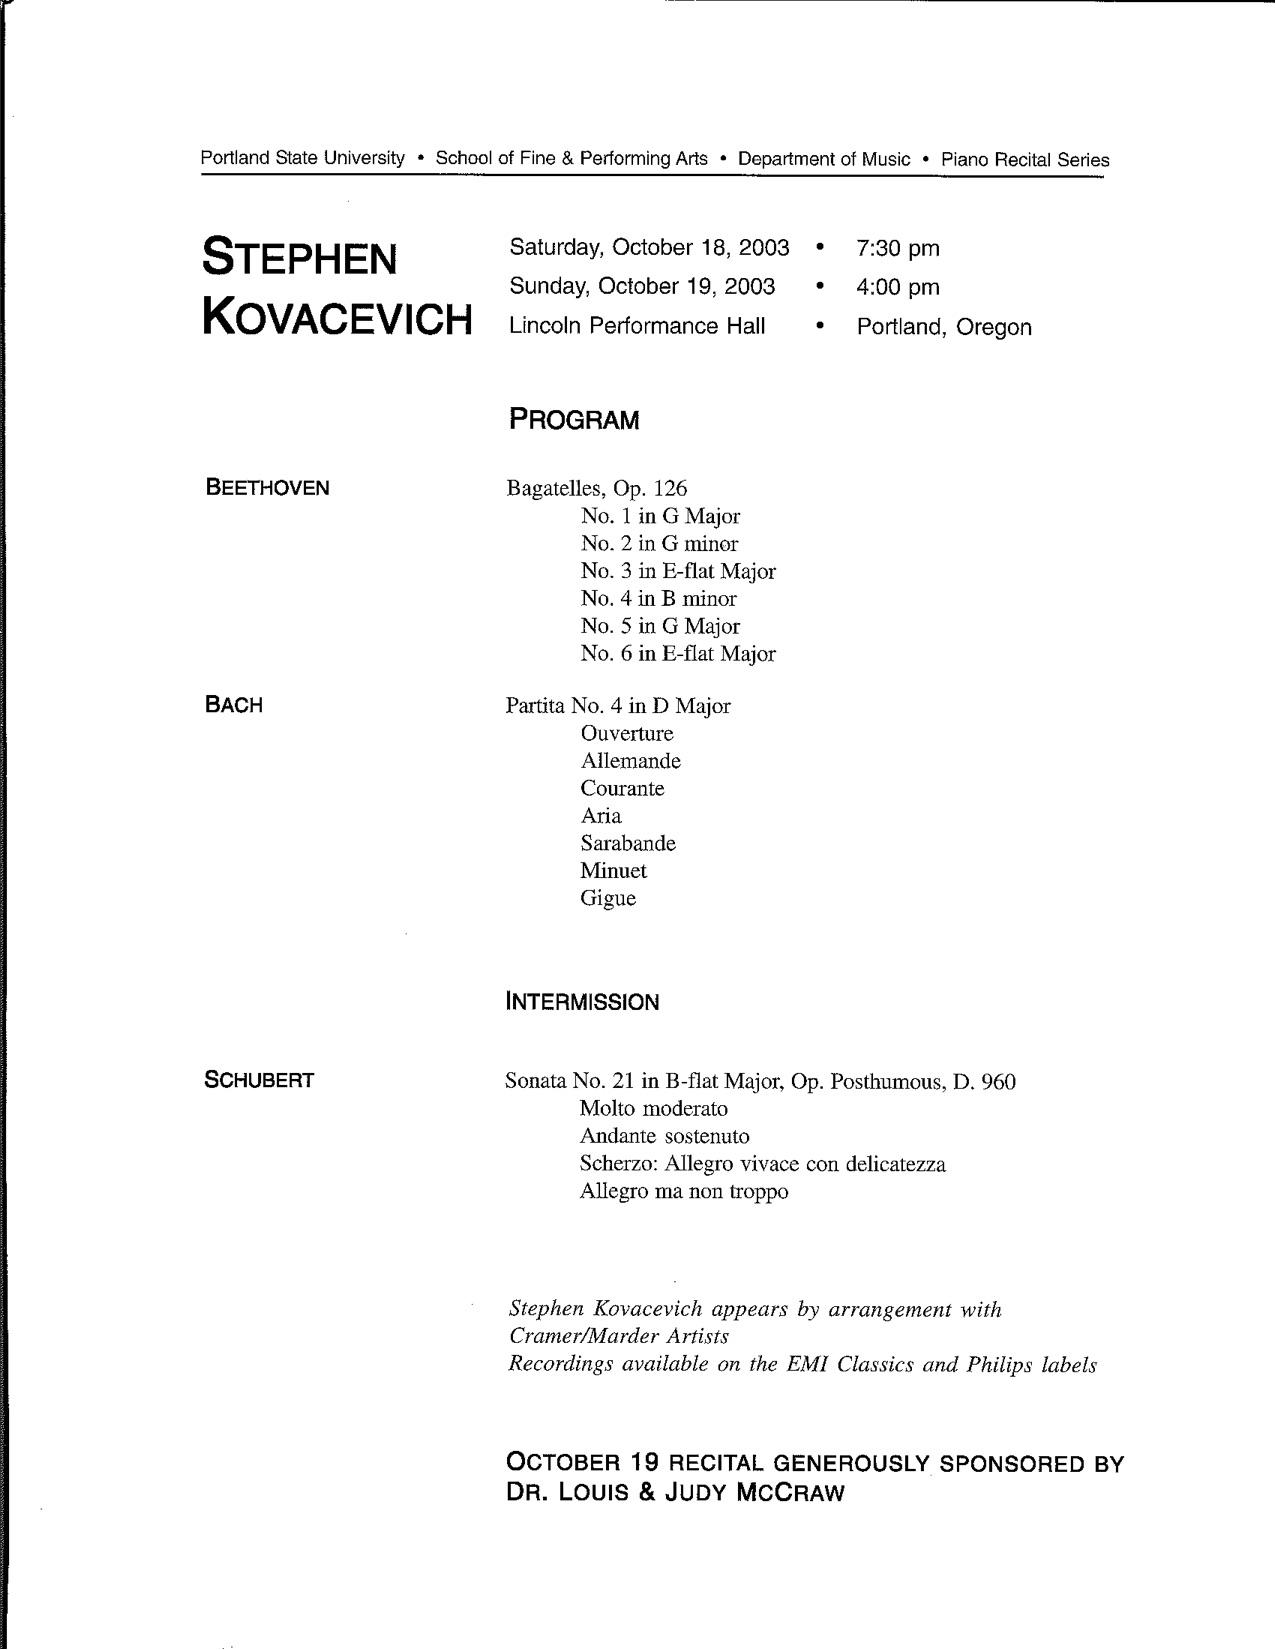 Kovacevich03-04_Program2.jpg